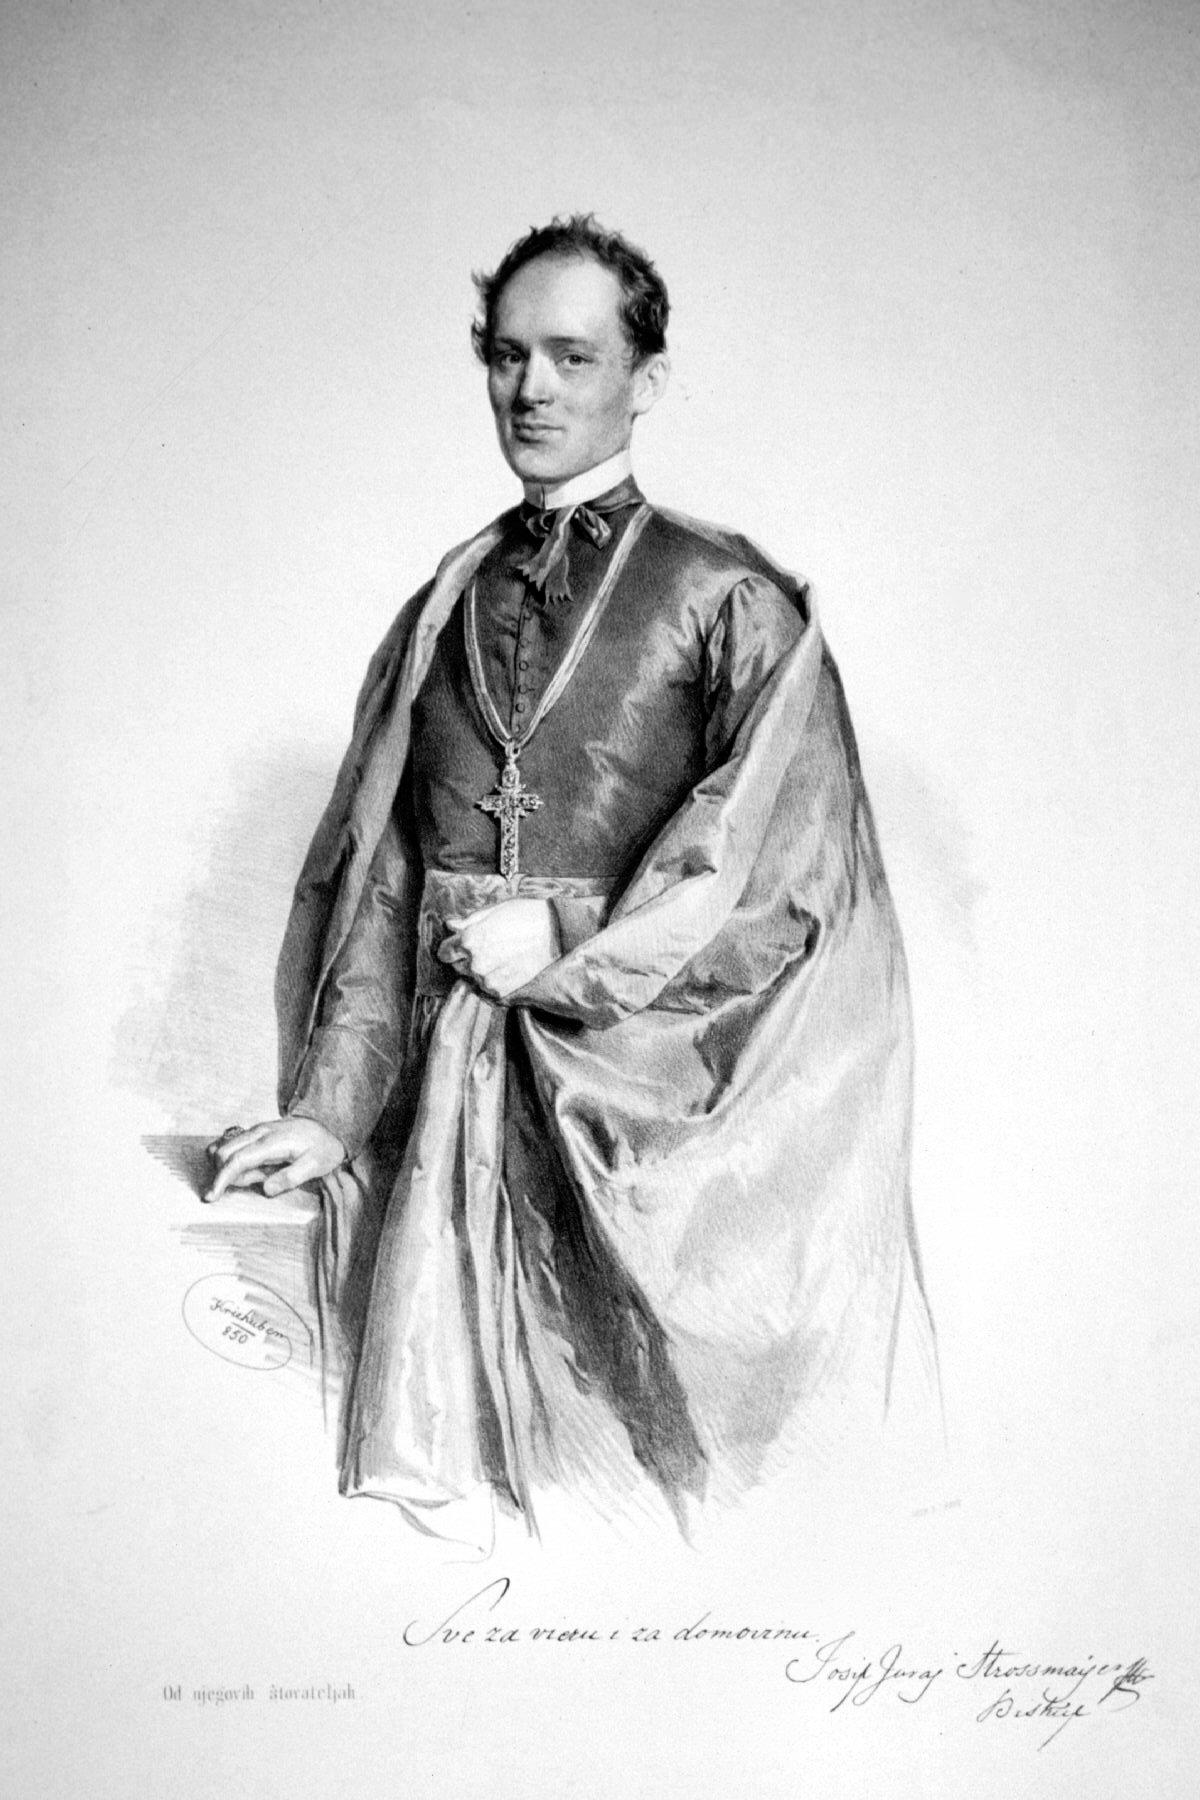 Josip Juraj Strossmayer